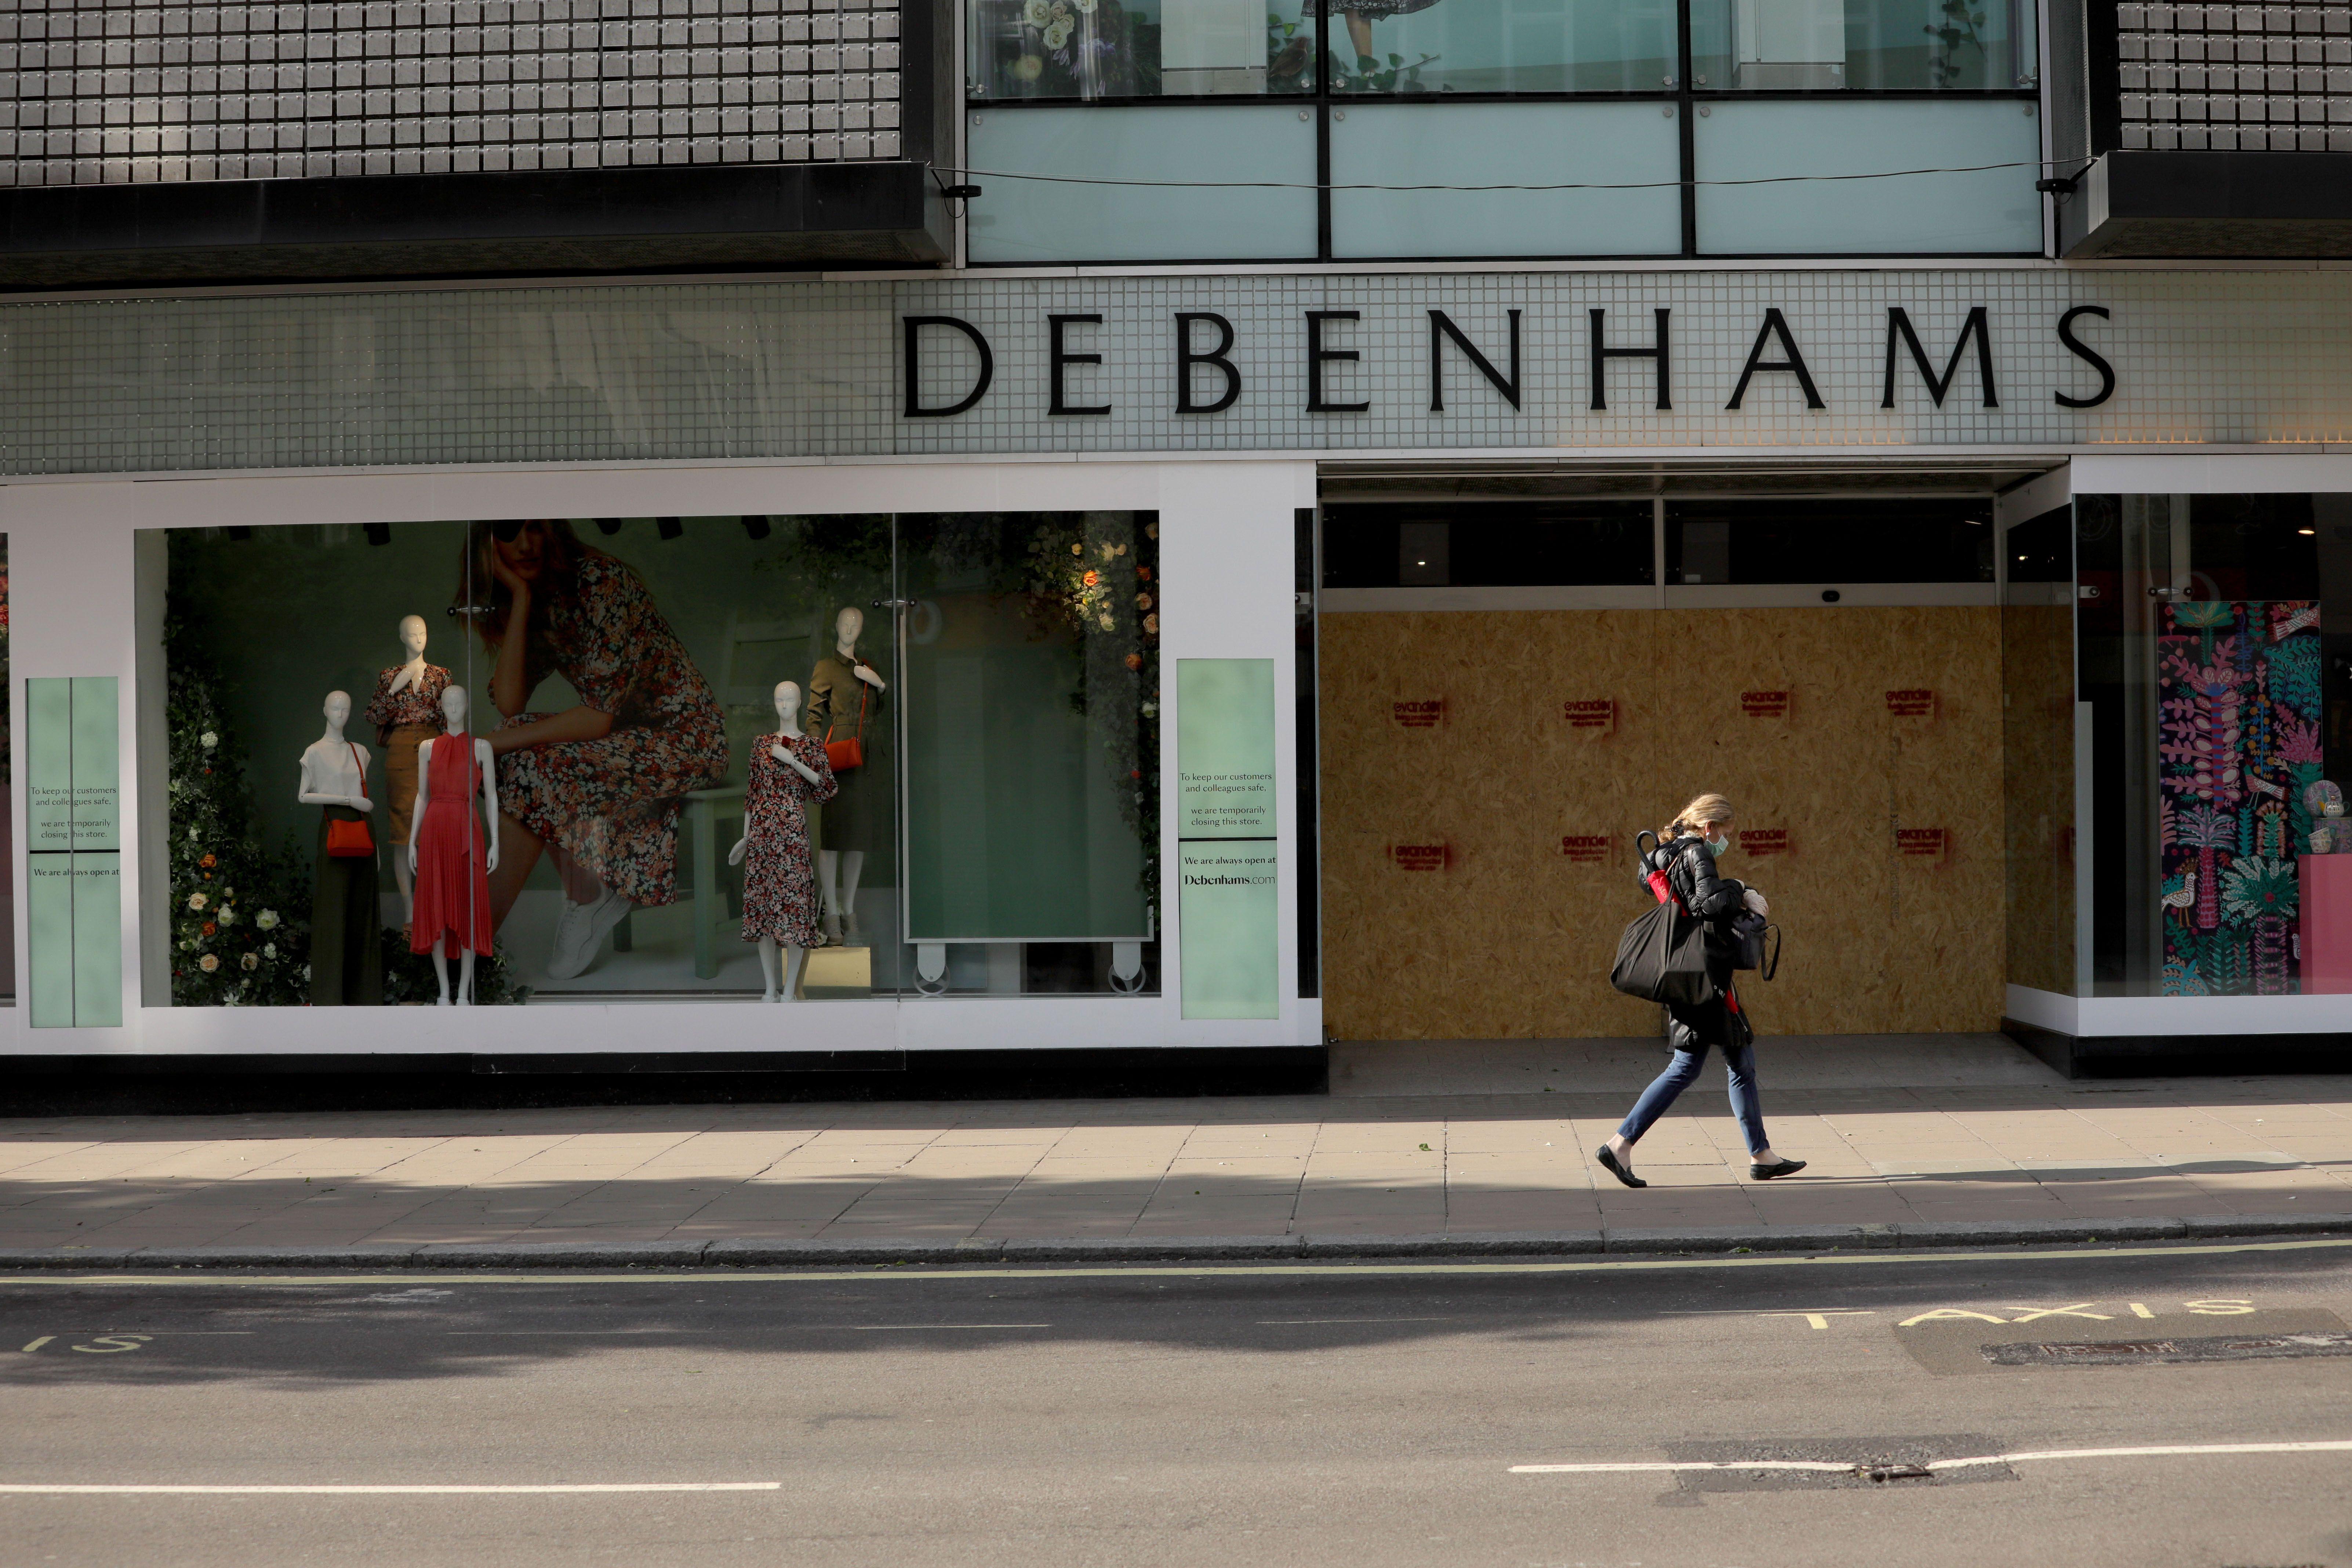 Oxford Street London debenhams store boarded up